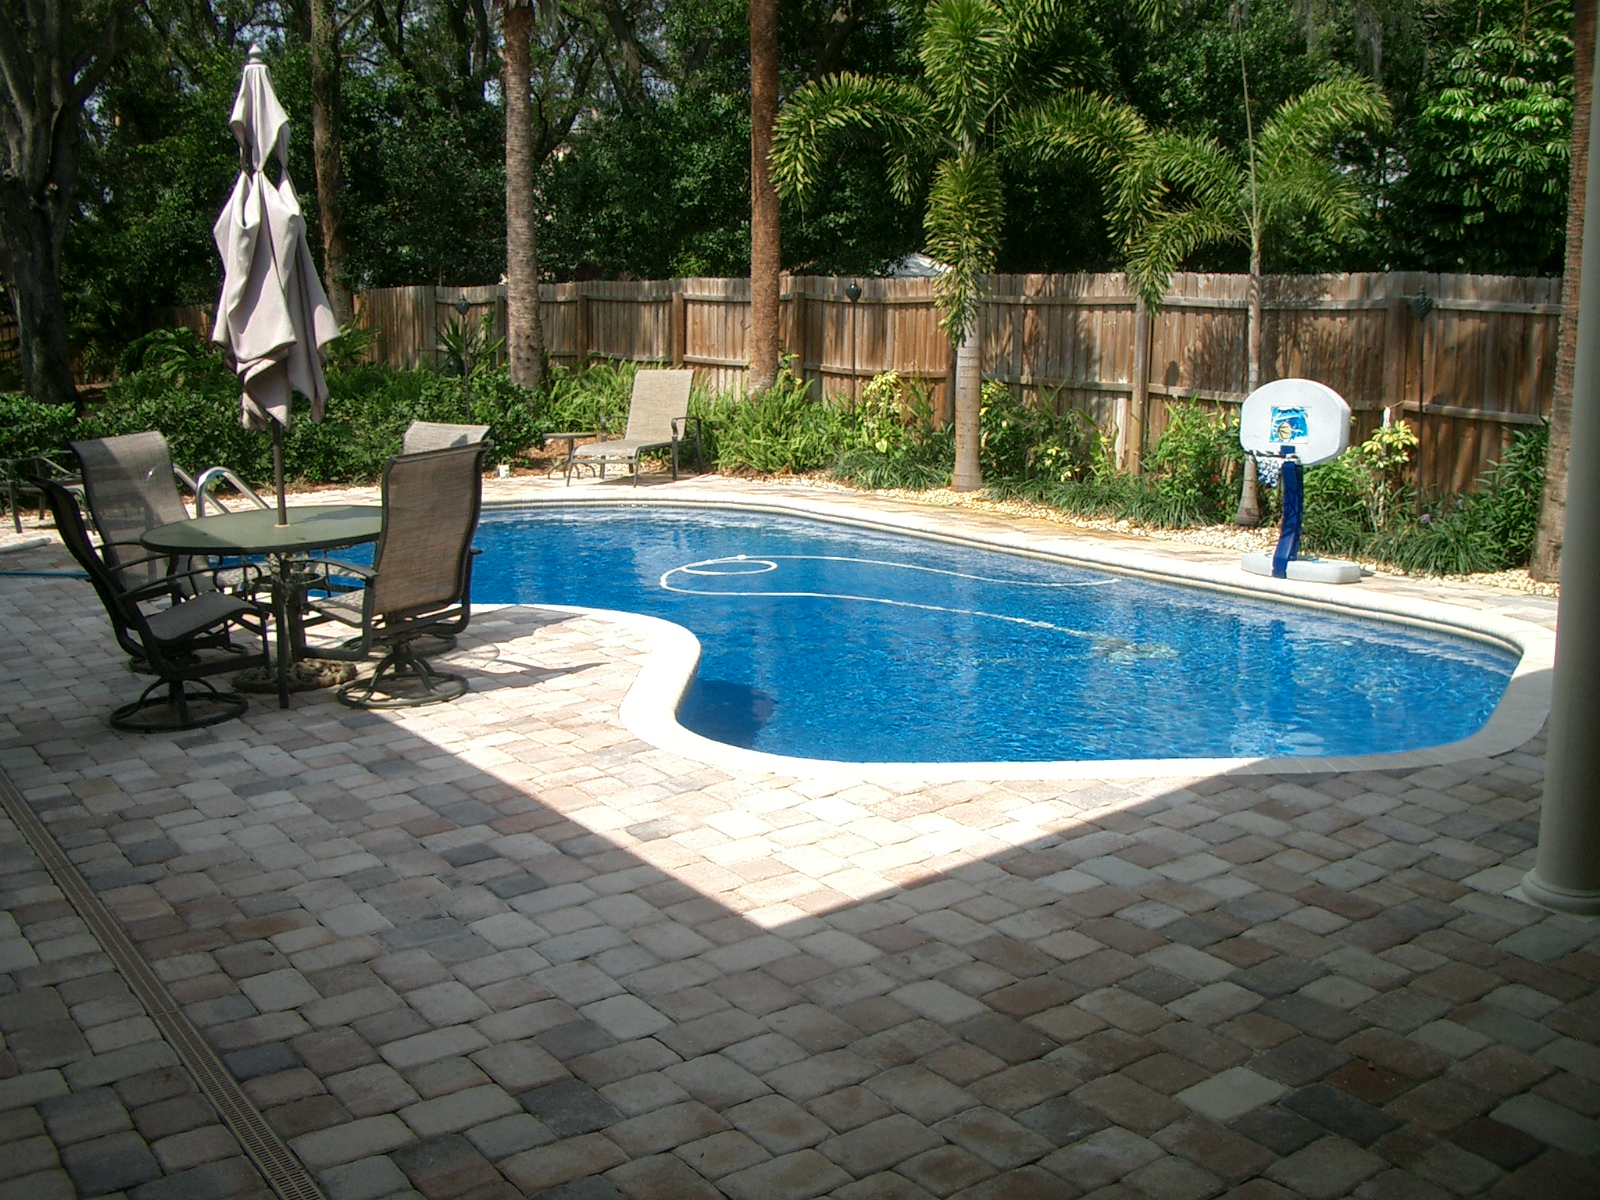 backyard design ideas with pool photo - 1